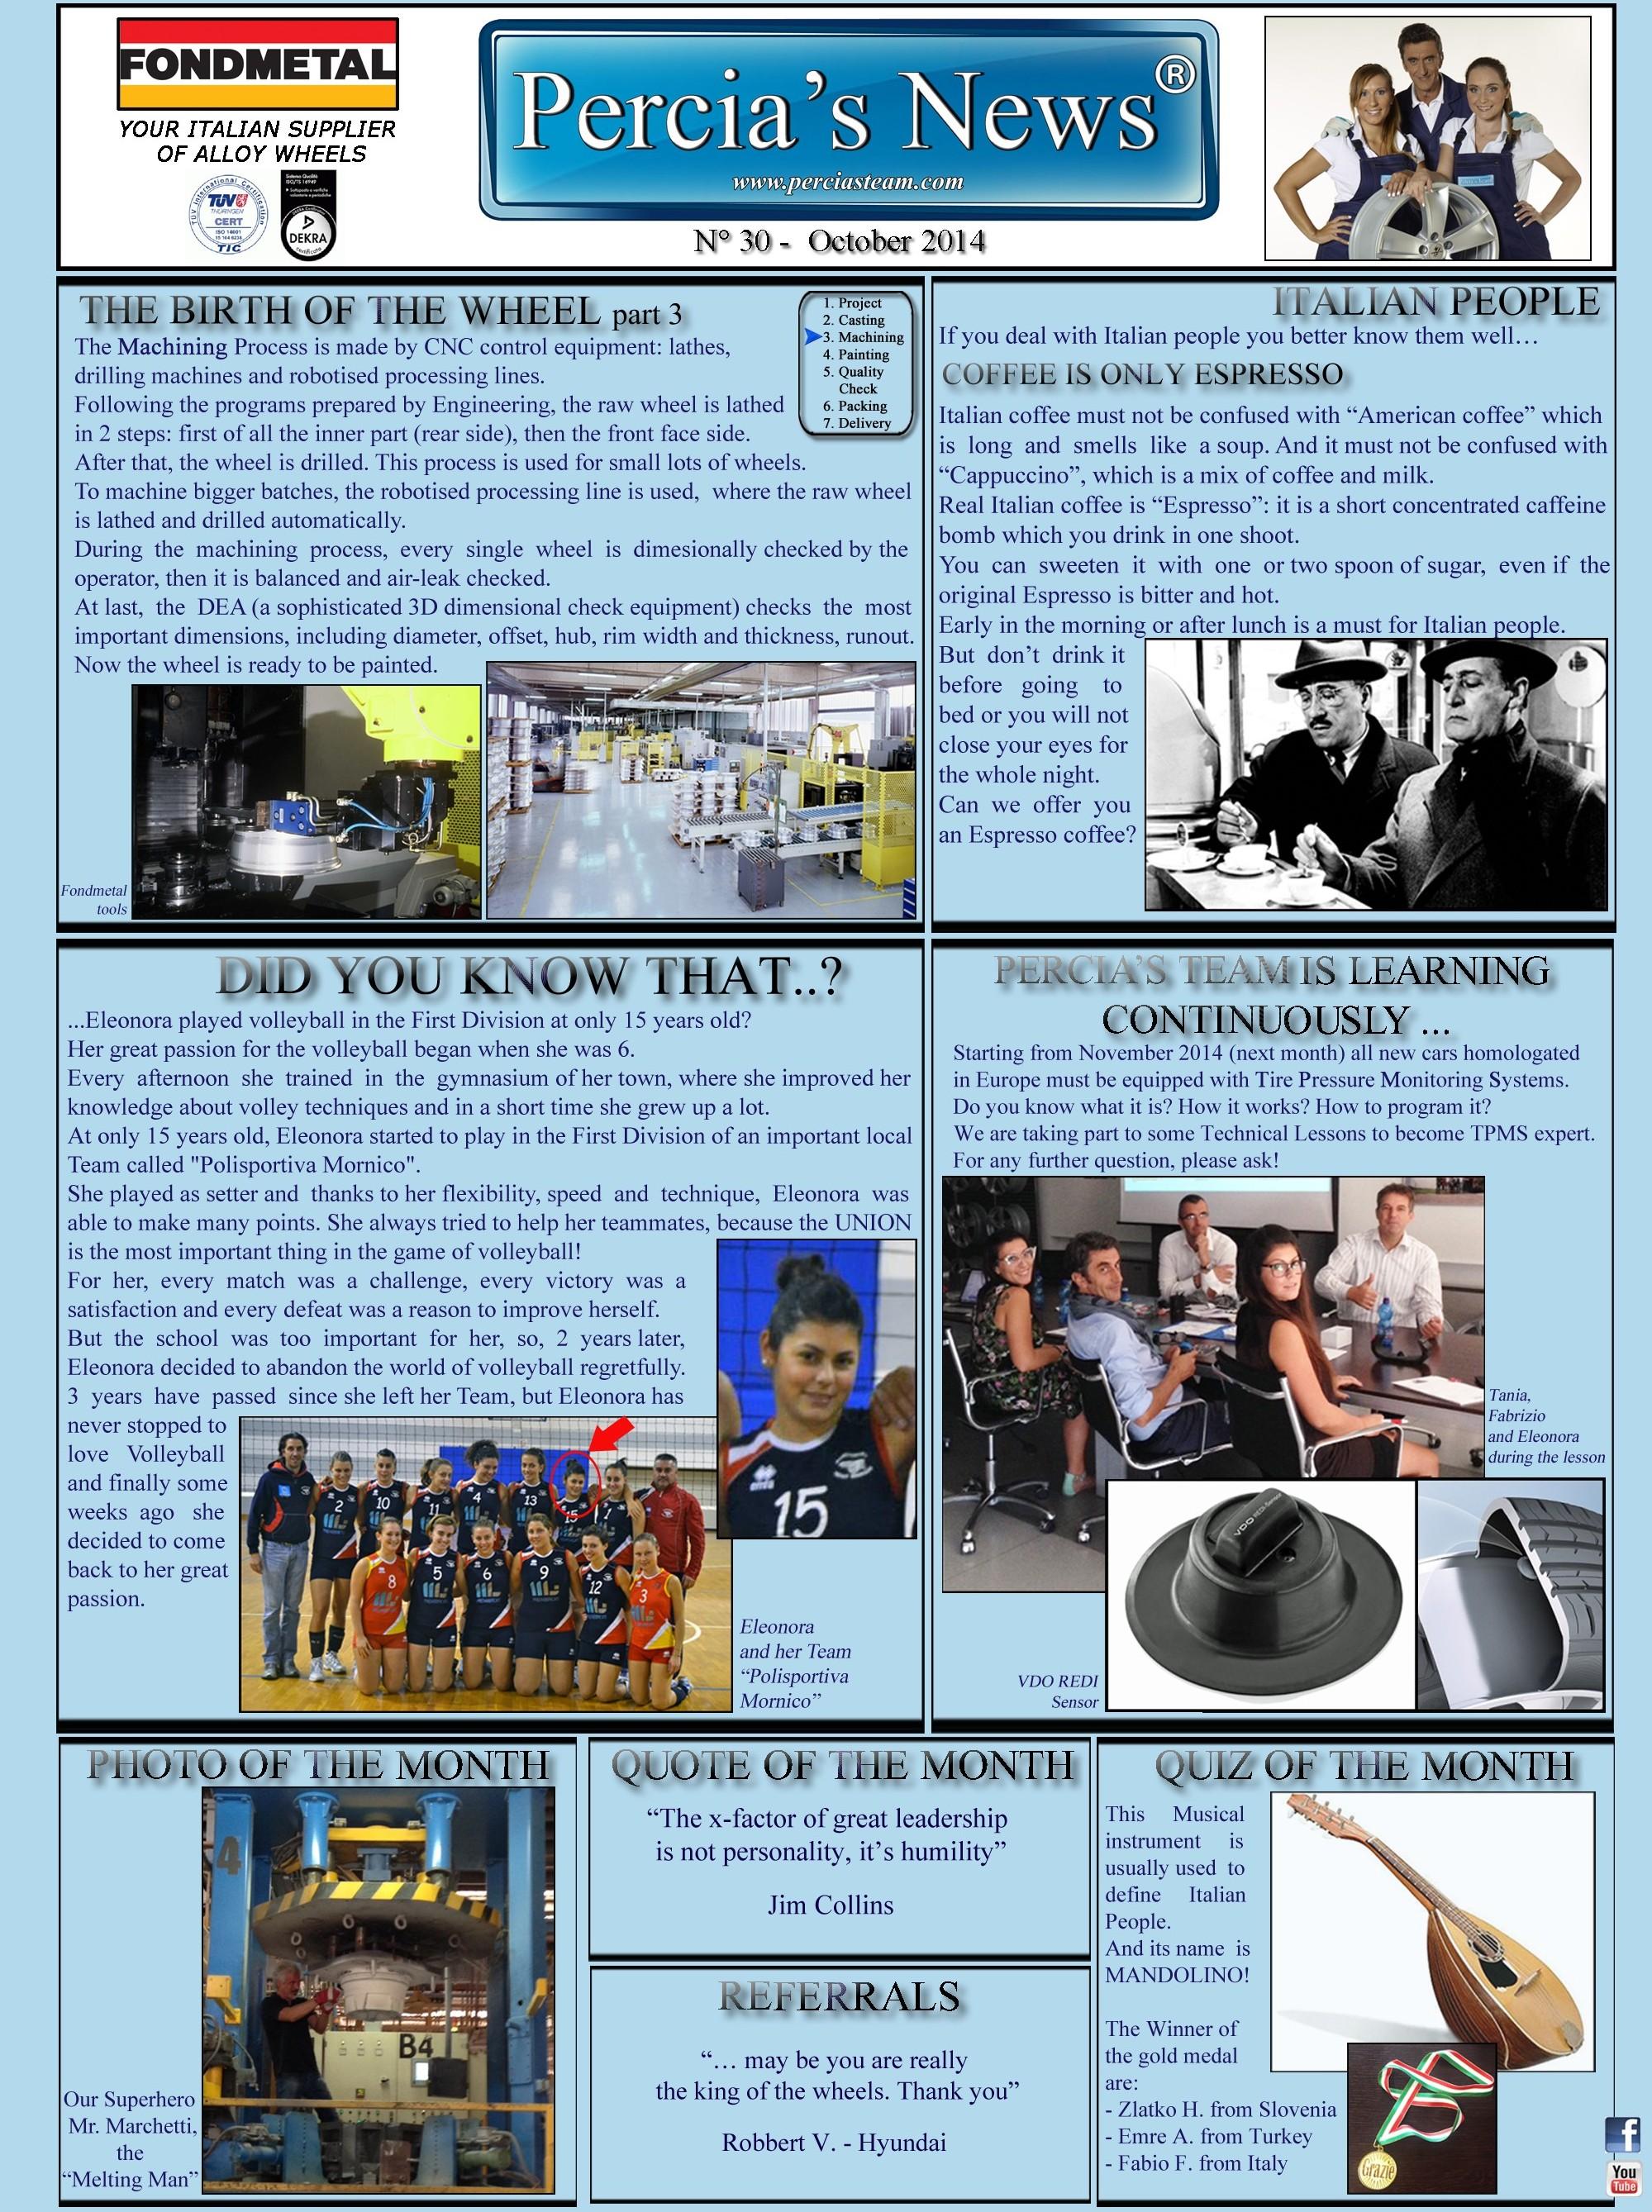 PERCIA'S NEWS OCTOBER 2014